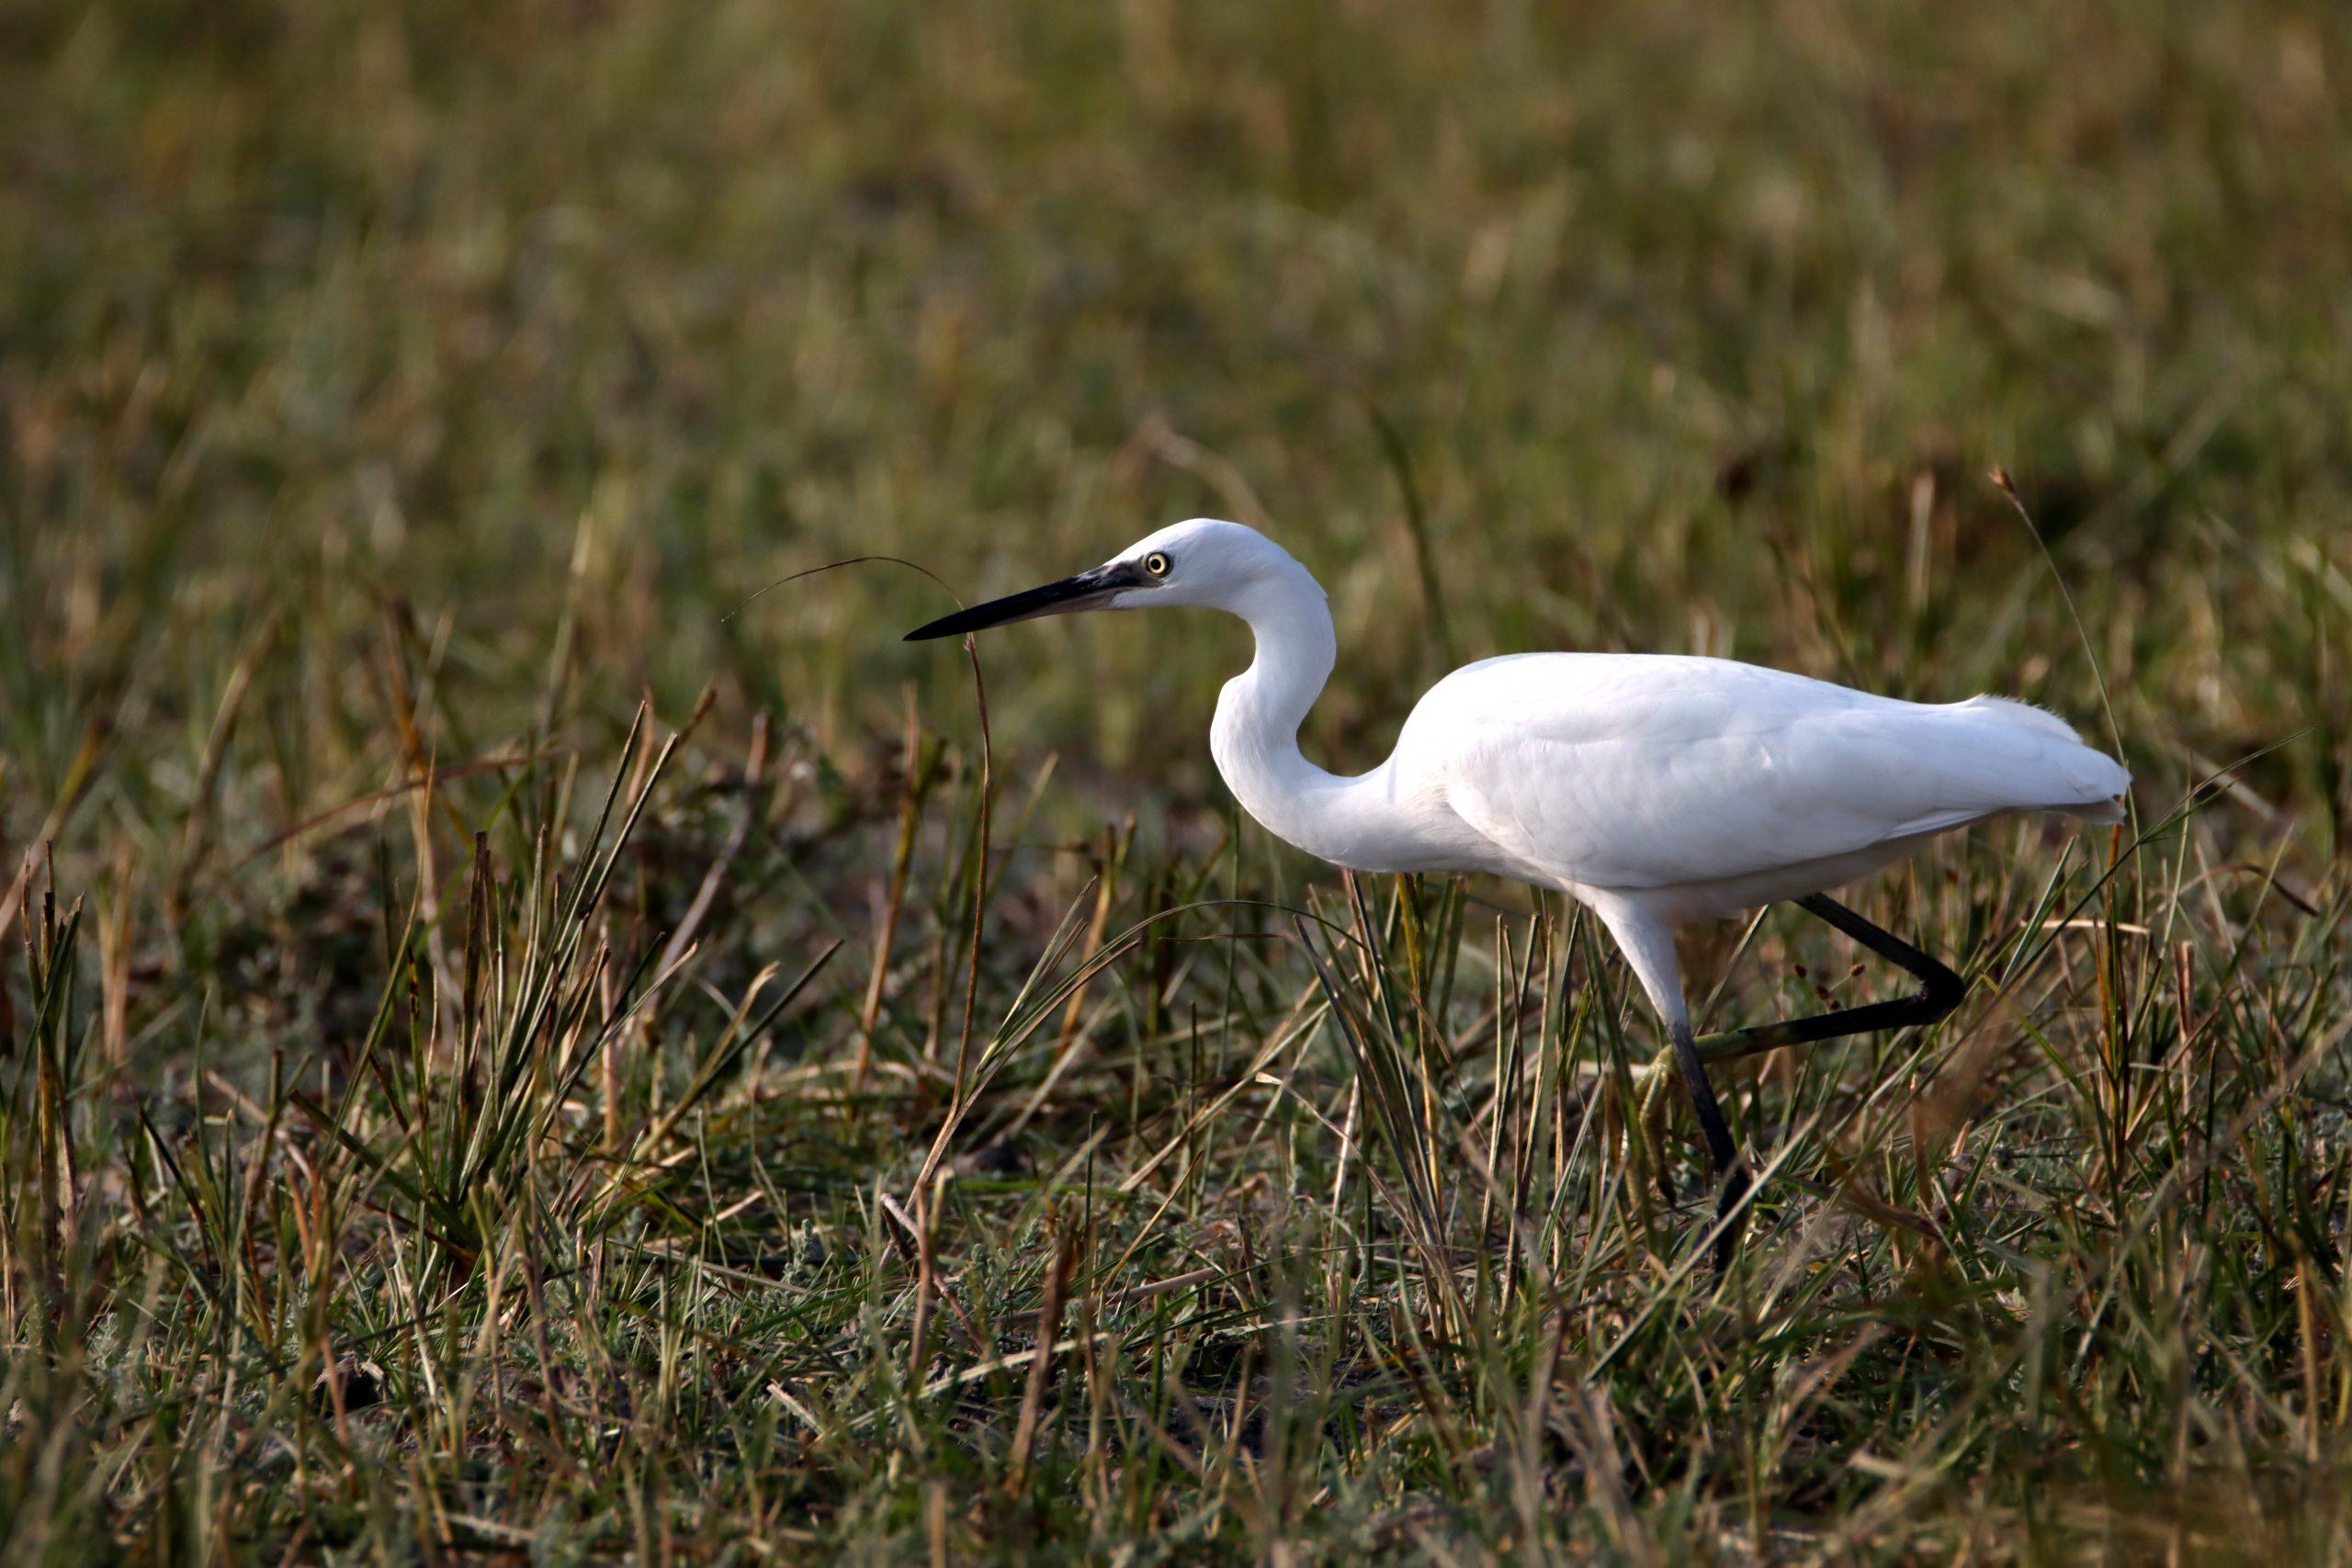 Little egret on grass land